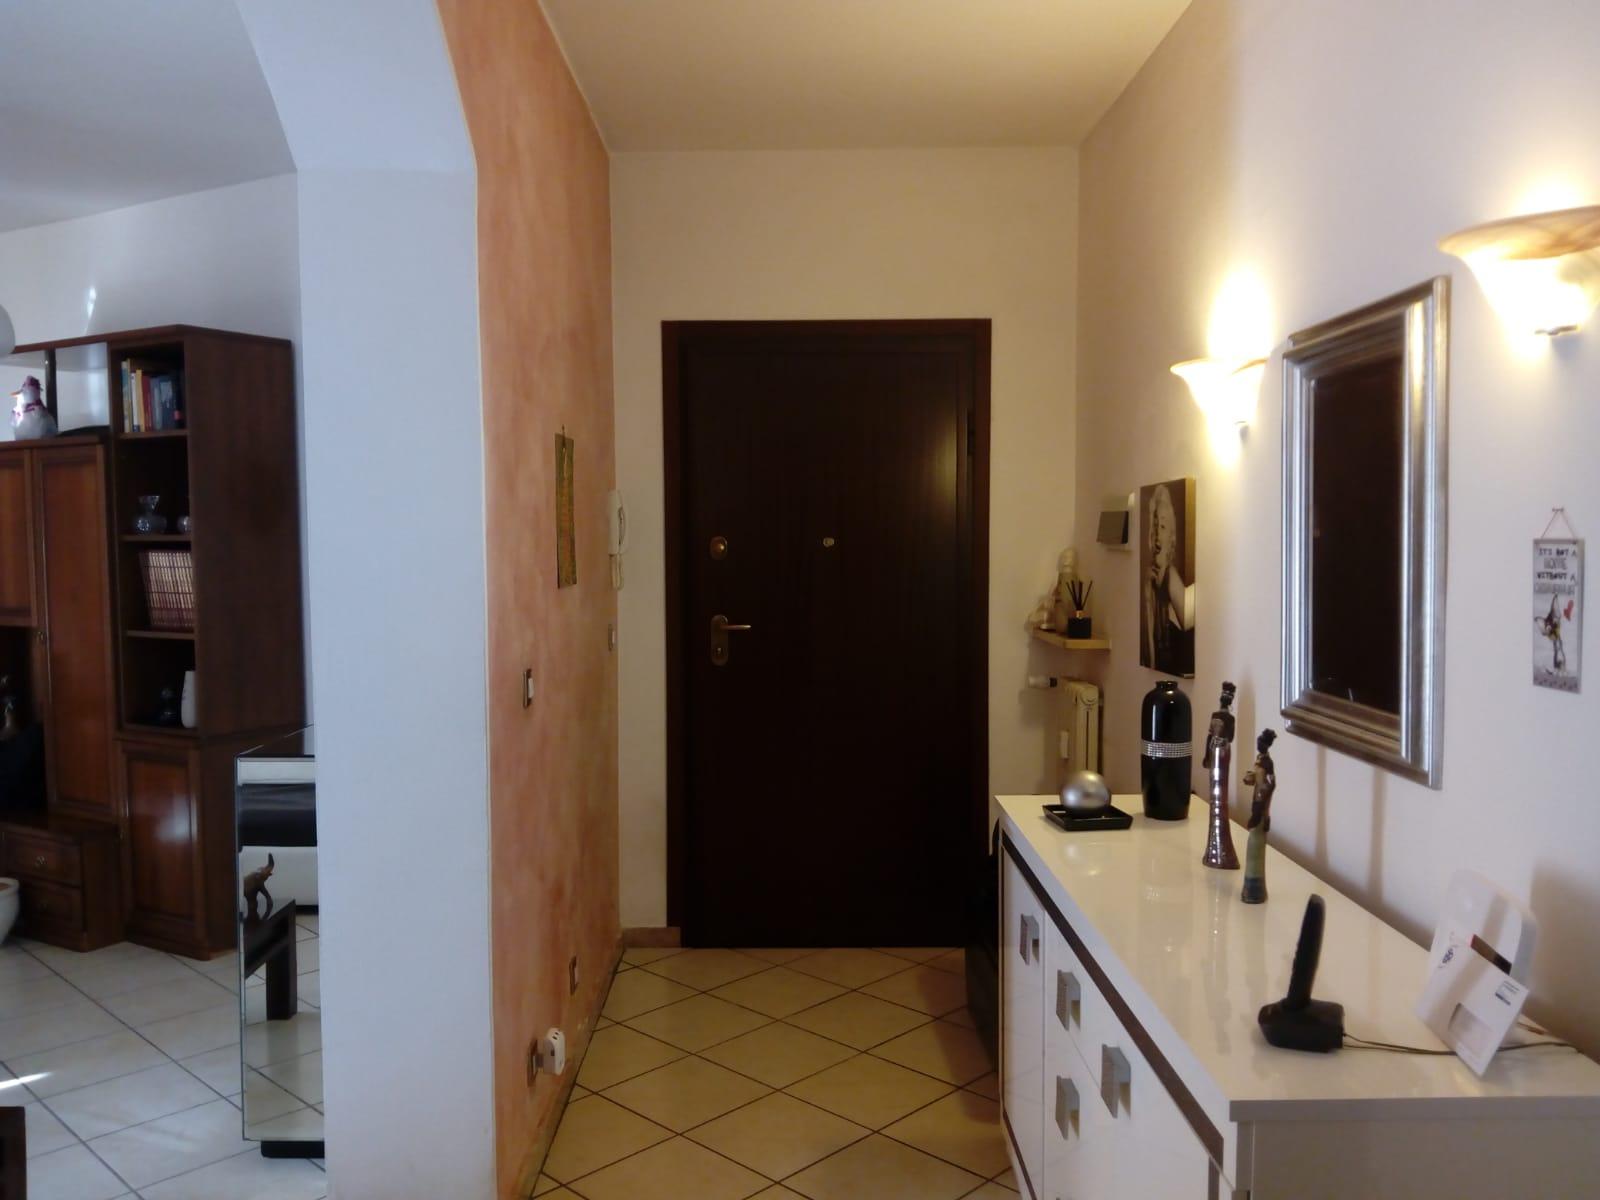 novara vendita quart: p. mortara - s. paolo costruzioni novaresi agenzia immobiliare